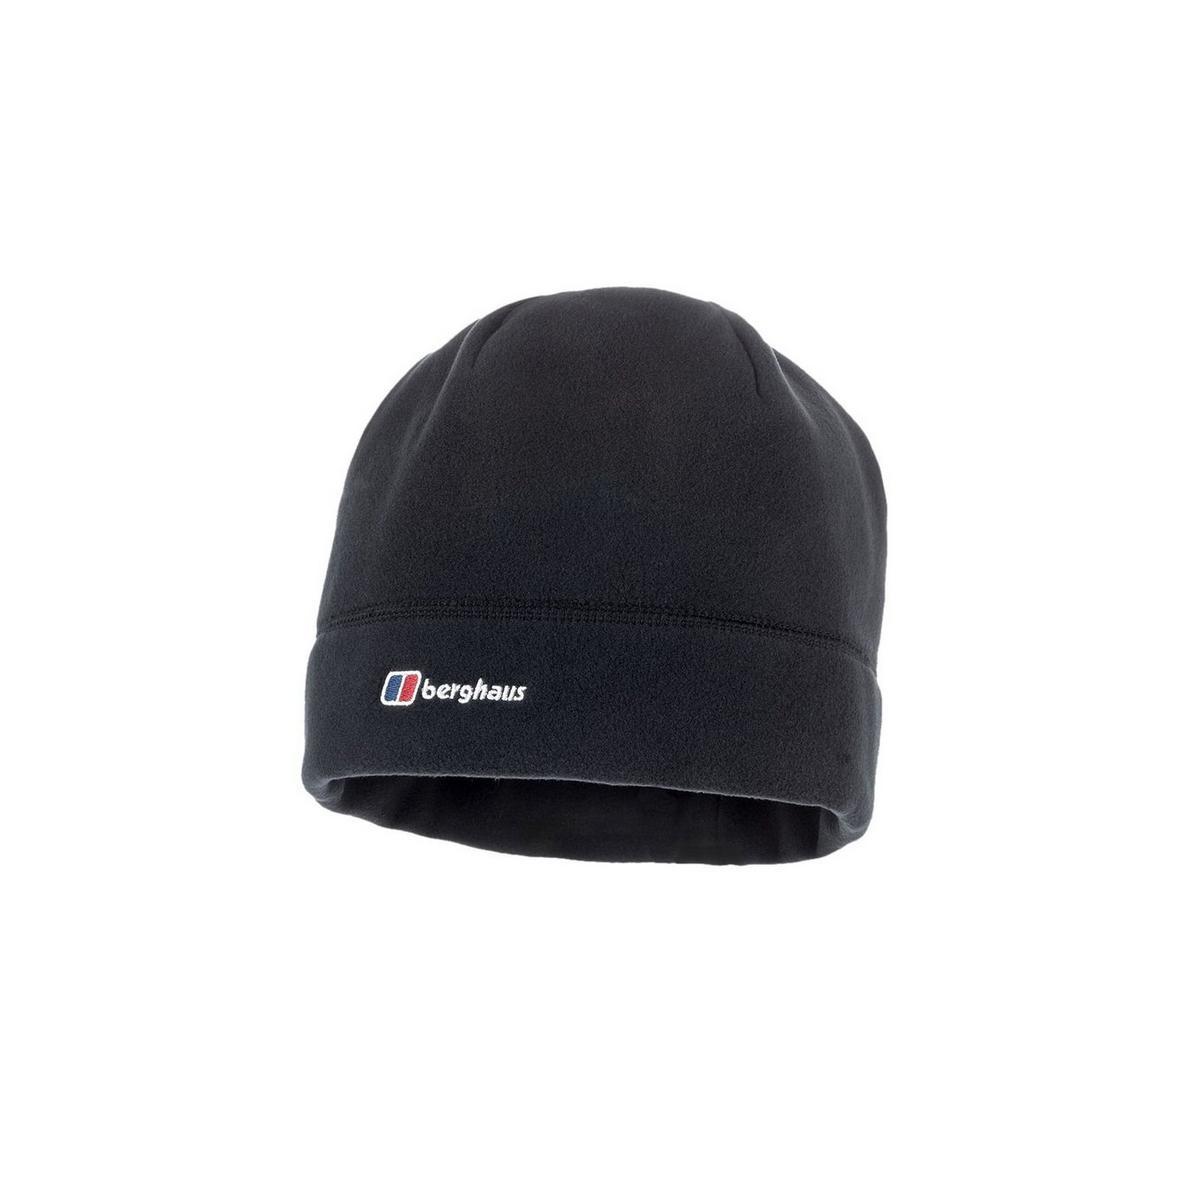 Berghaus Men's Berghaus Spectrum Hat - Black